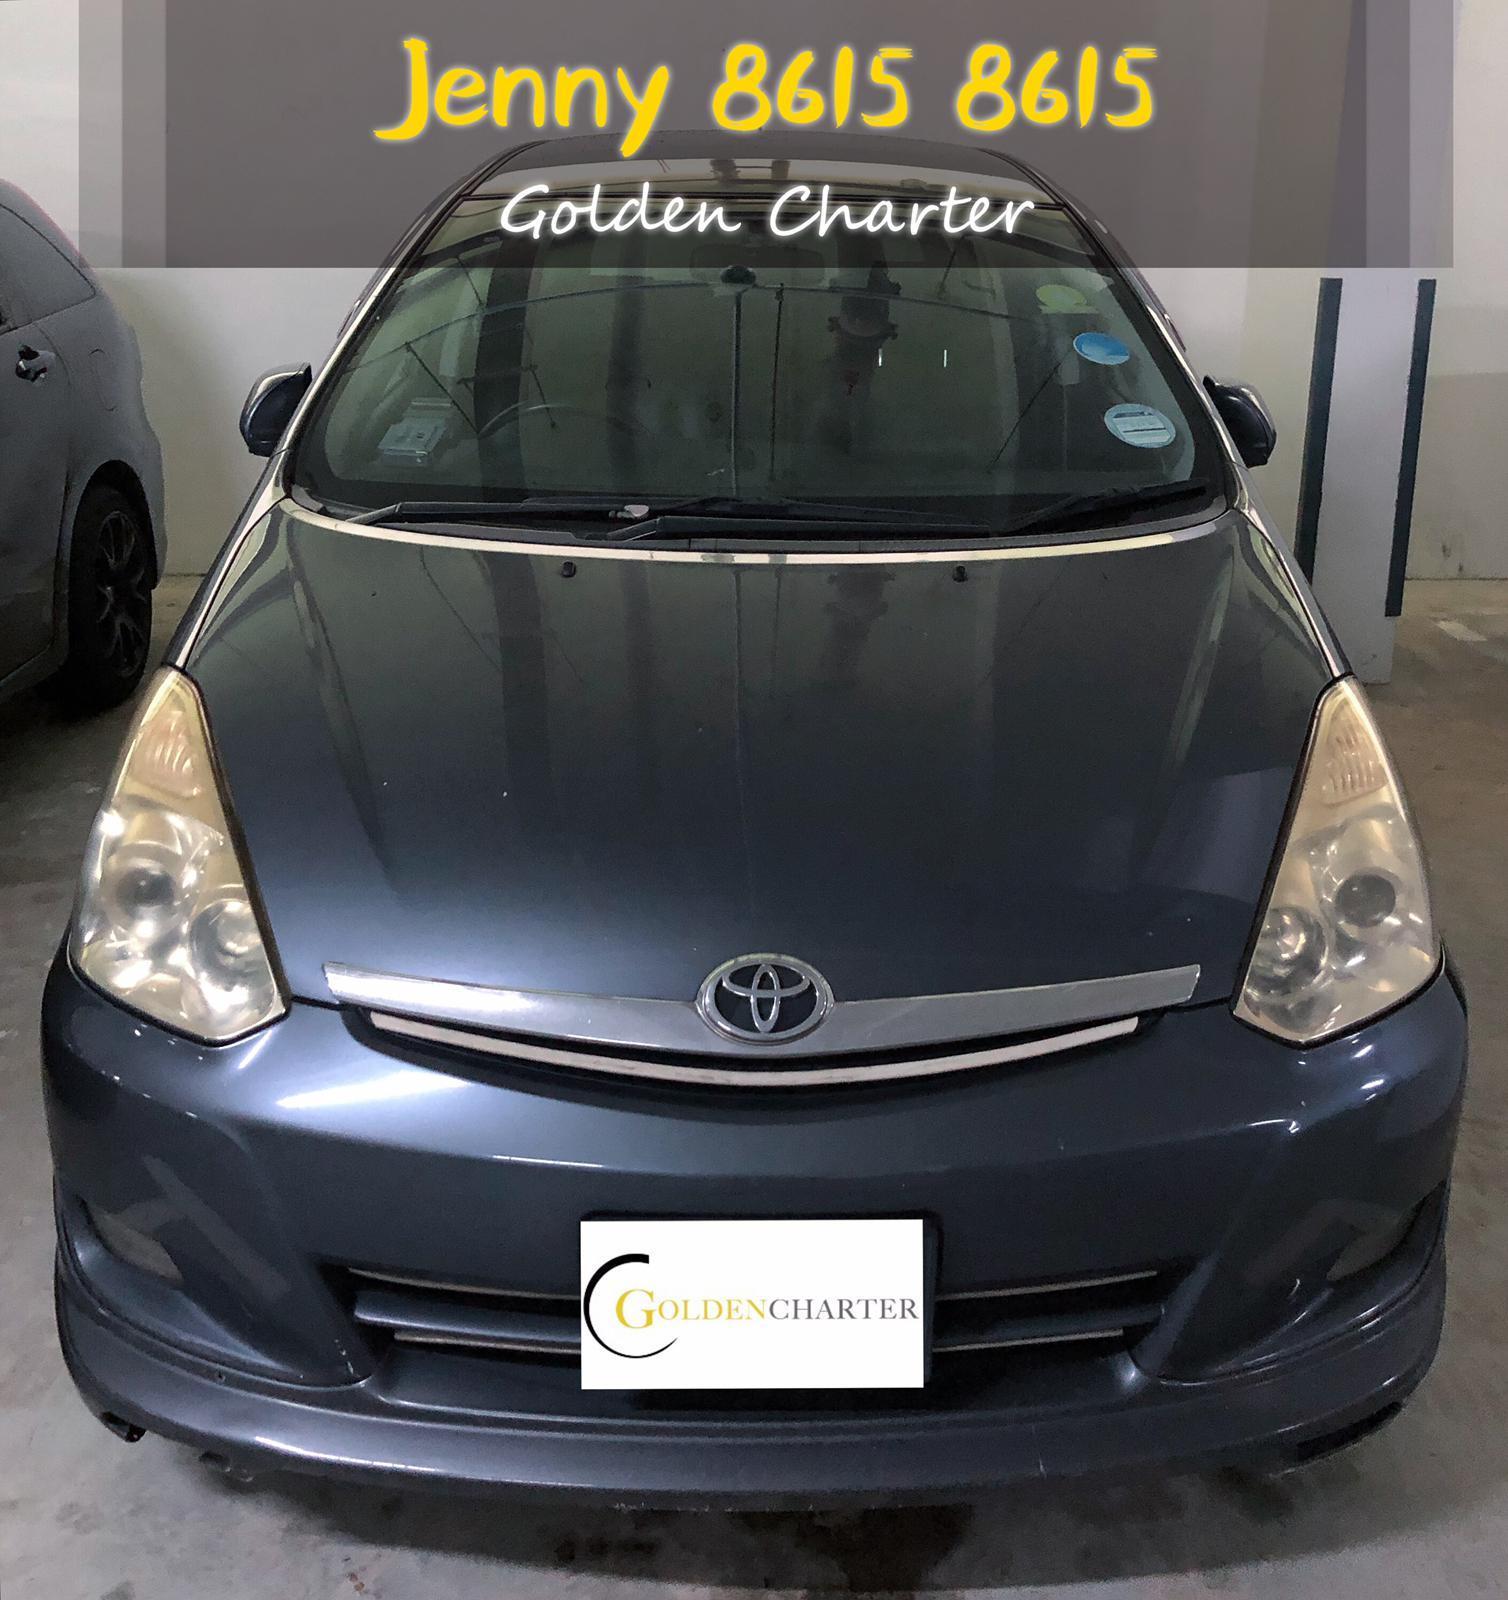 Toyota Wish 1.8a MPV car rent fot PHV gojek,grab n ryde.personal use.cheaper rental.